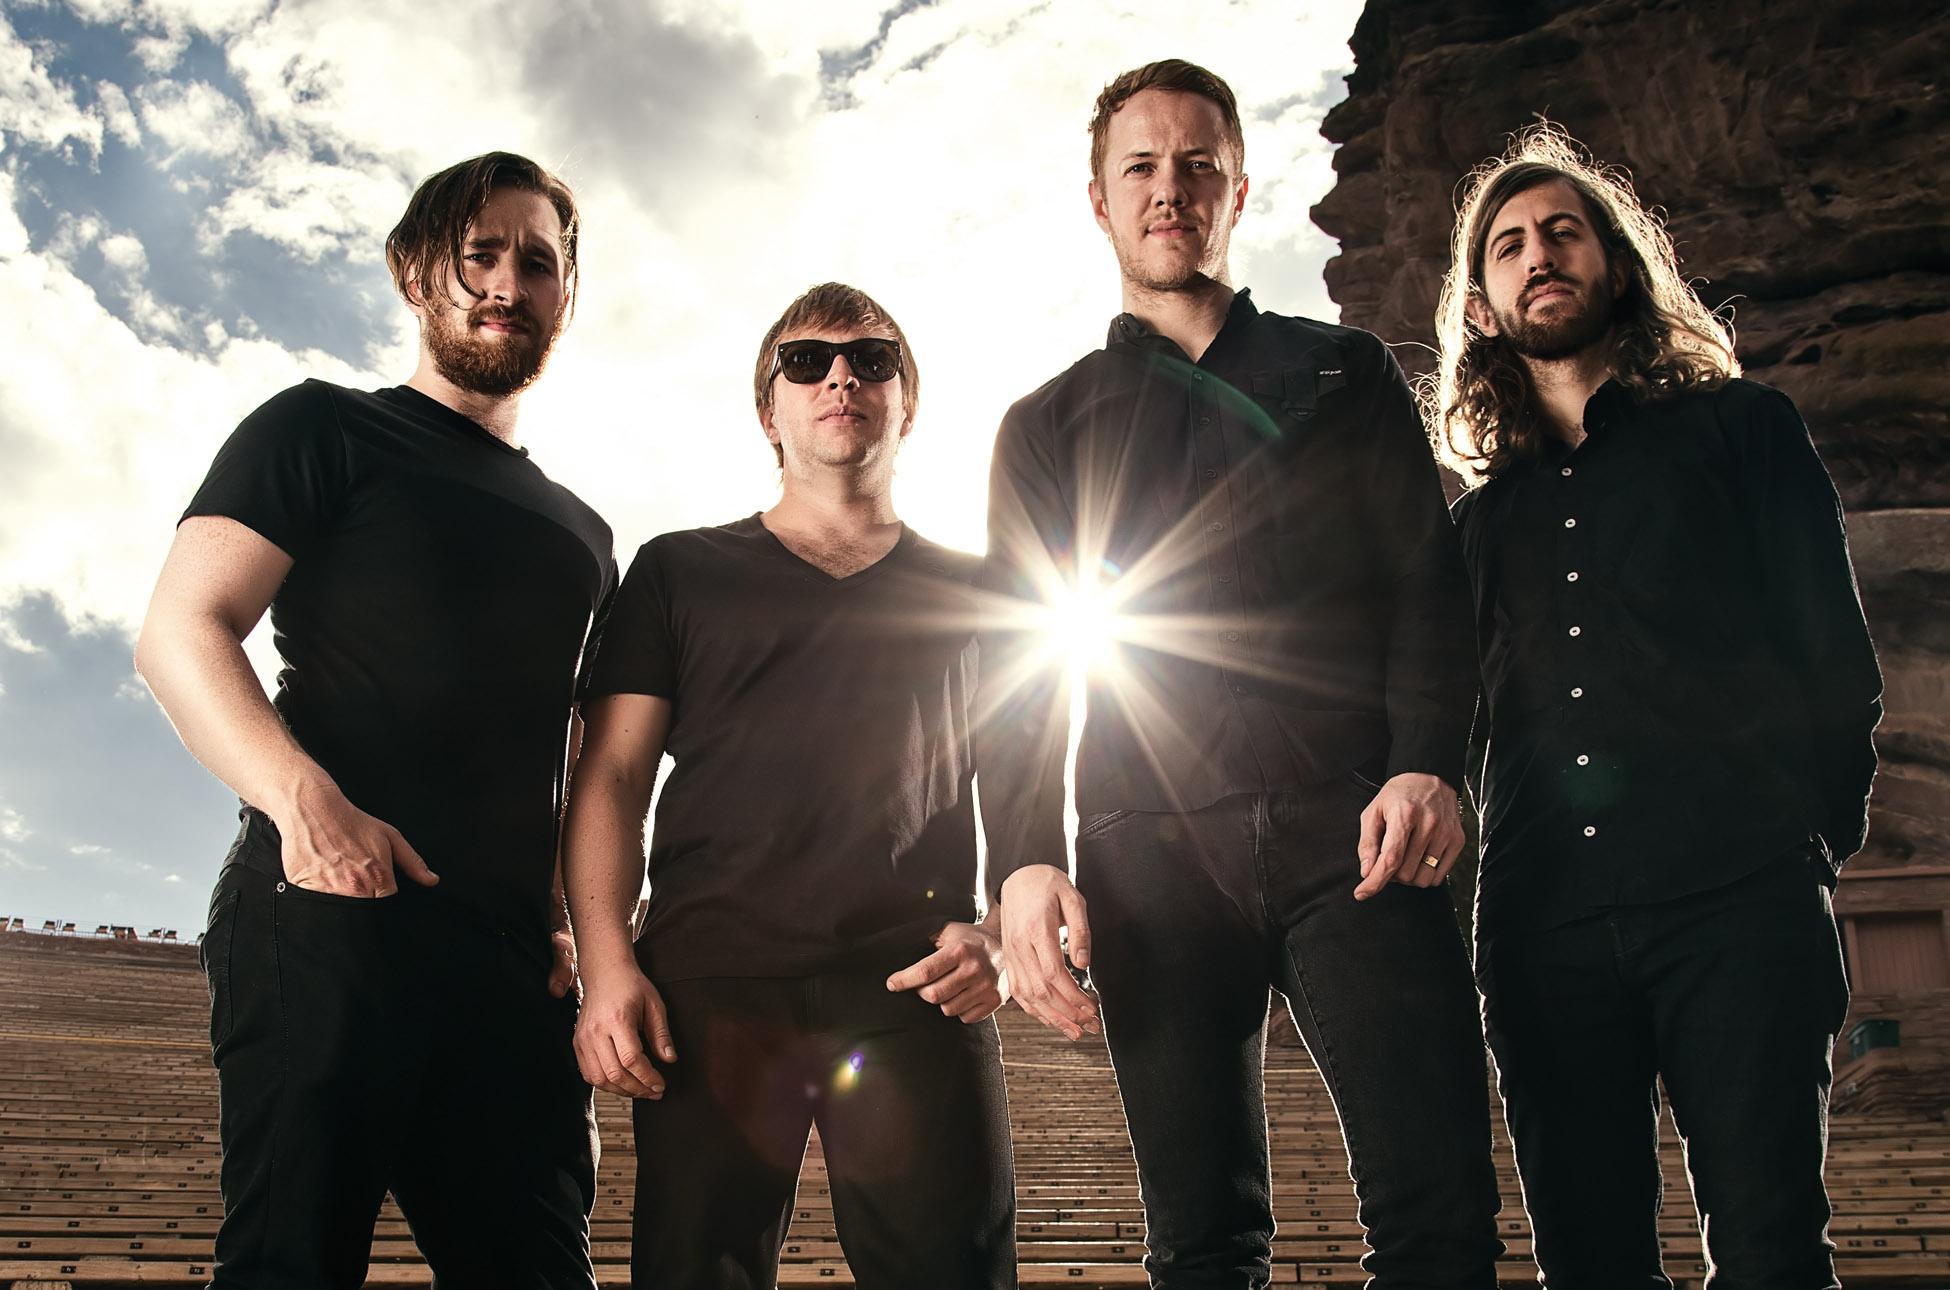 ¿Se acerca nueva música de Imagine Dragons?